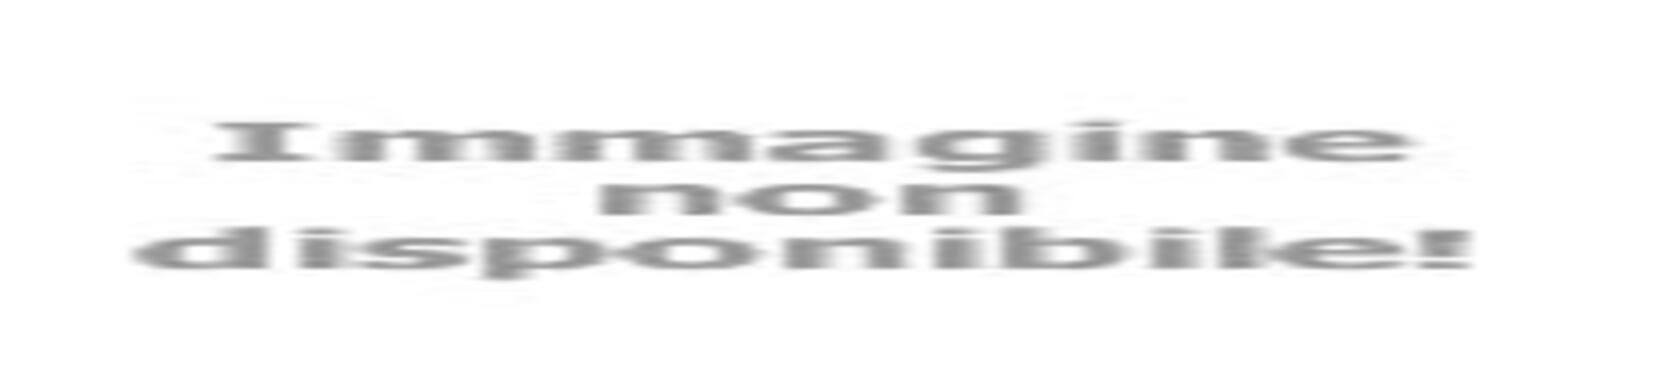 basketriminicrabs it 6-2726-video-eybl-u20-playoff-intervista-coach-firic-e-urukalo 003